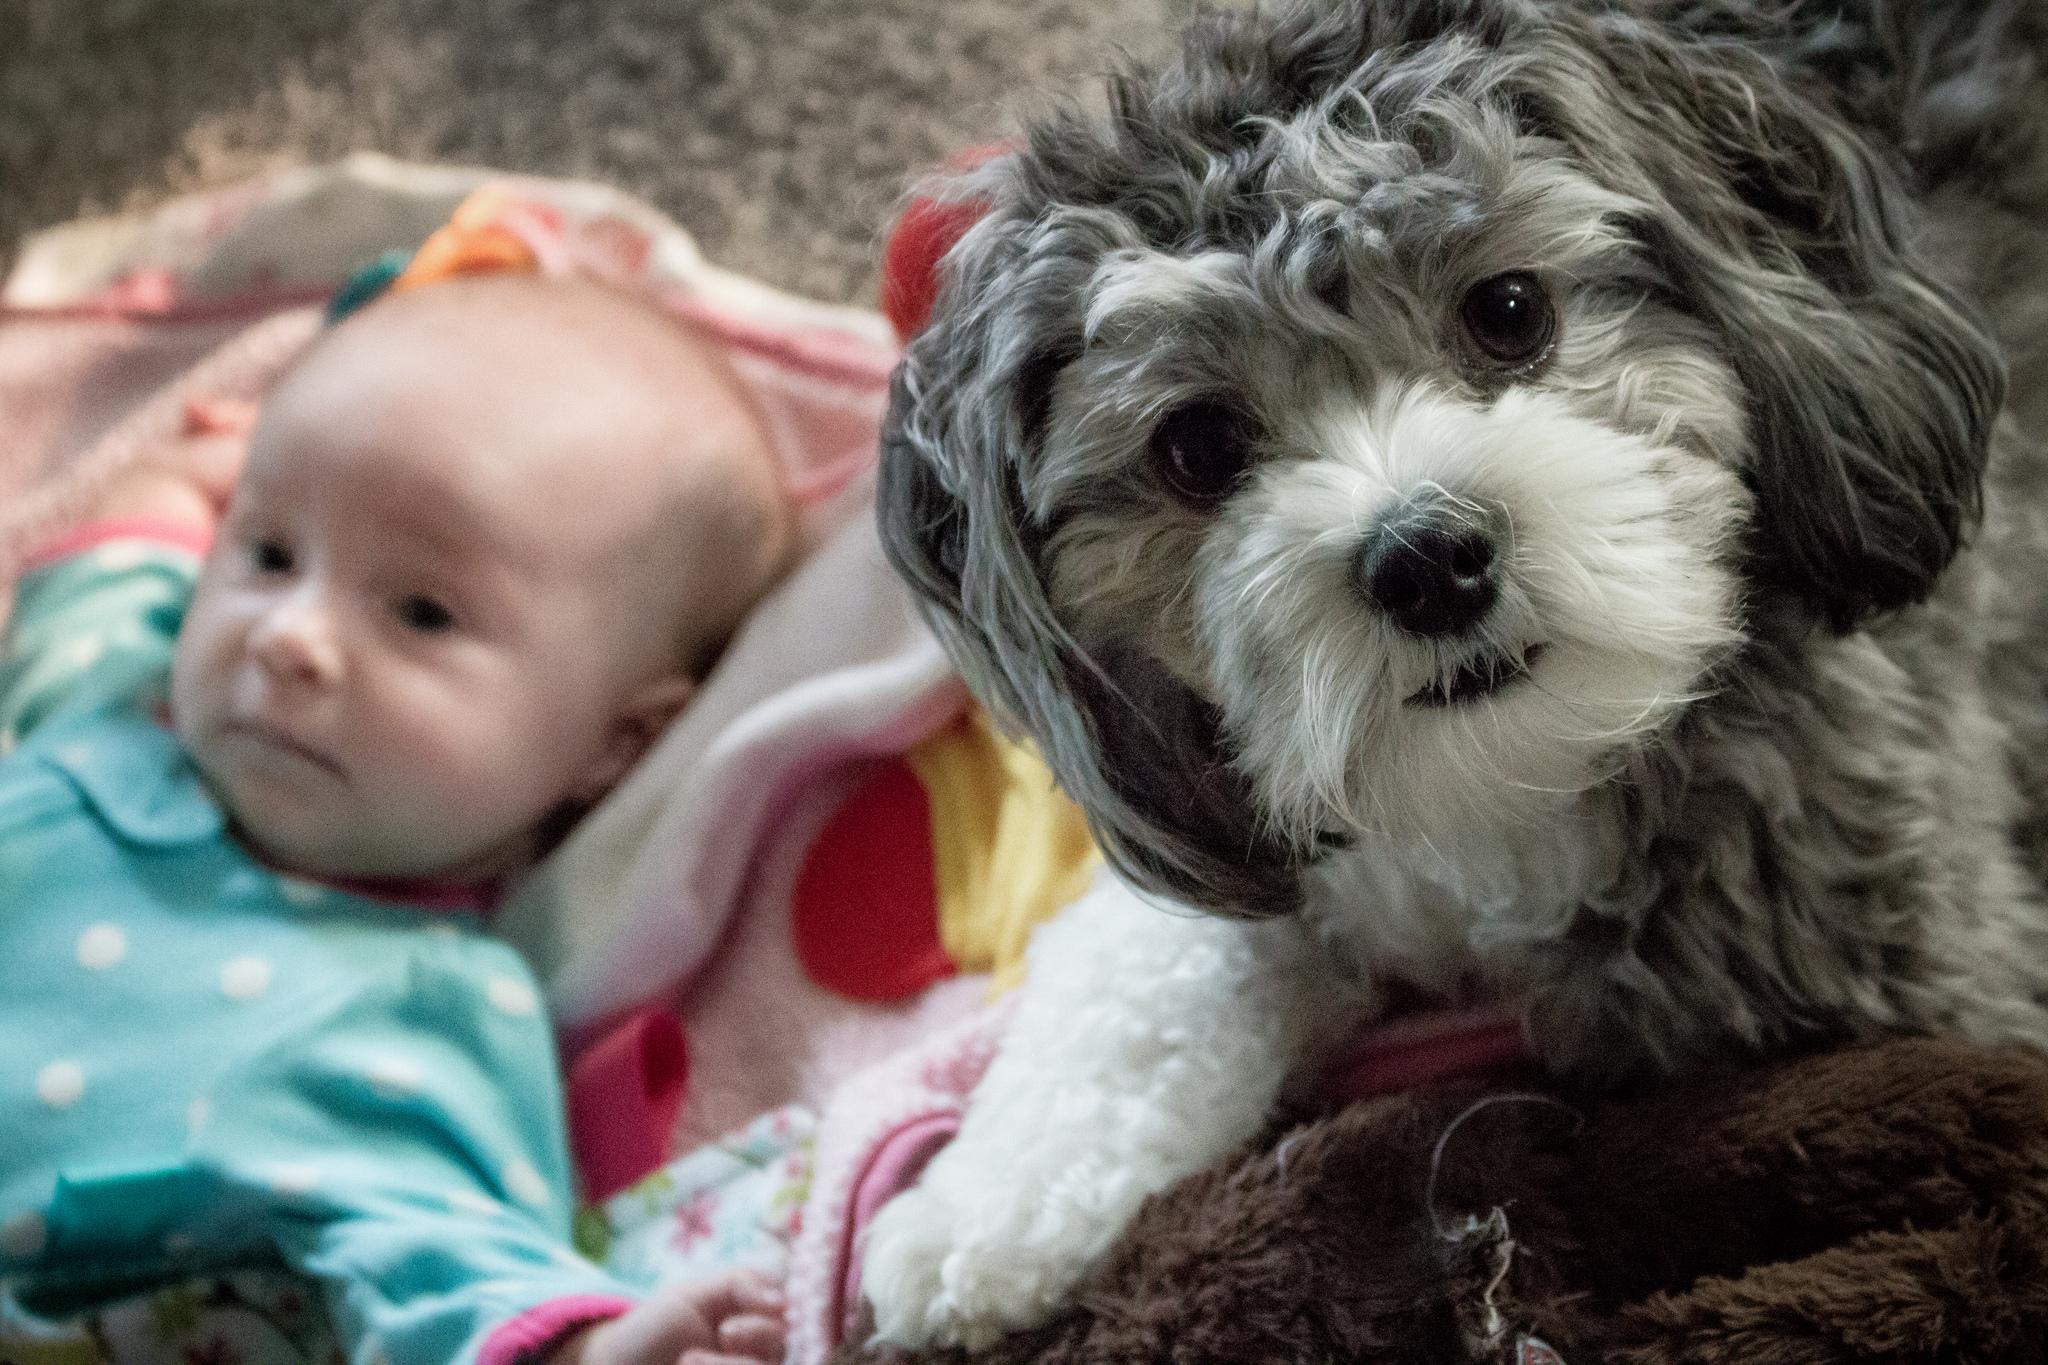 Dog or baby quiz